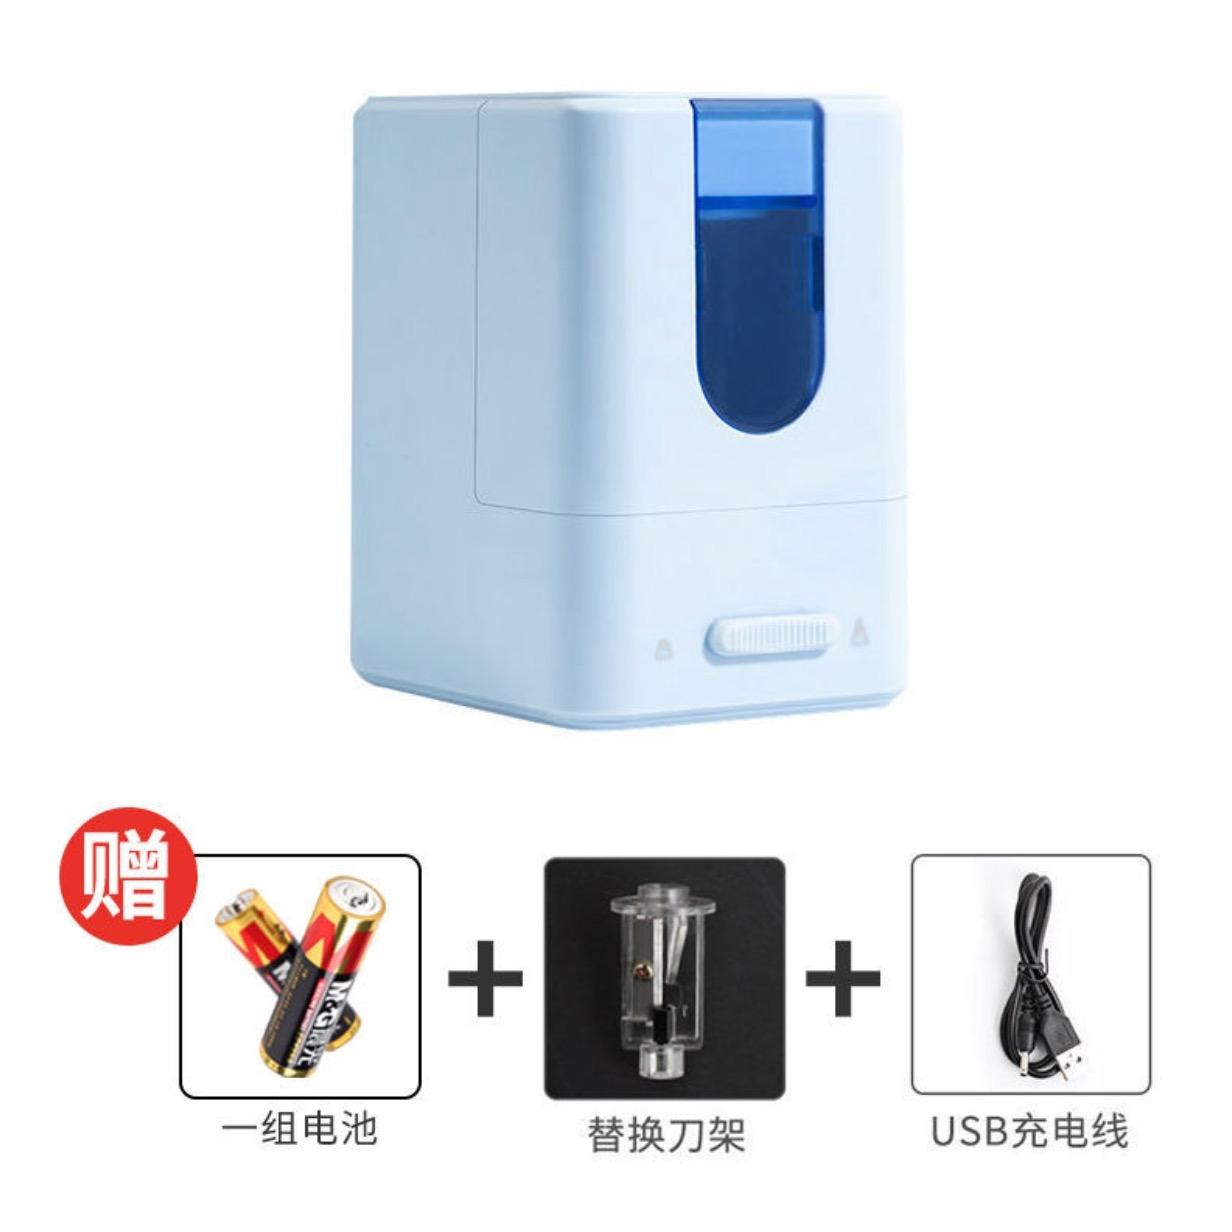 M&G 晨光 APS906A5 电动削笔机 蓝色 送电池+刀架+充电线